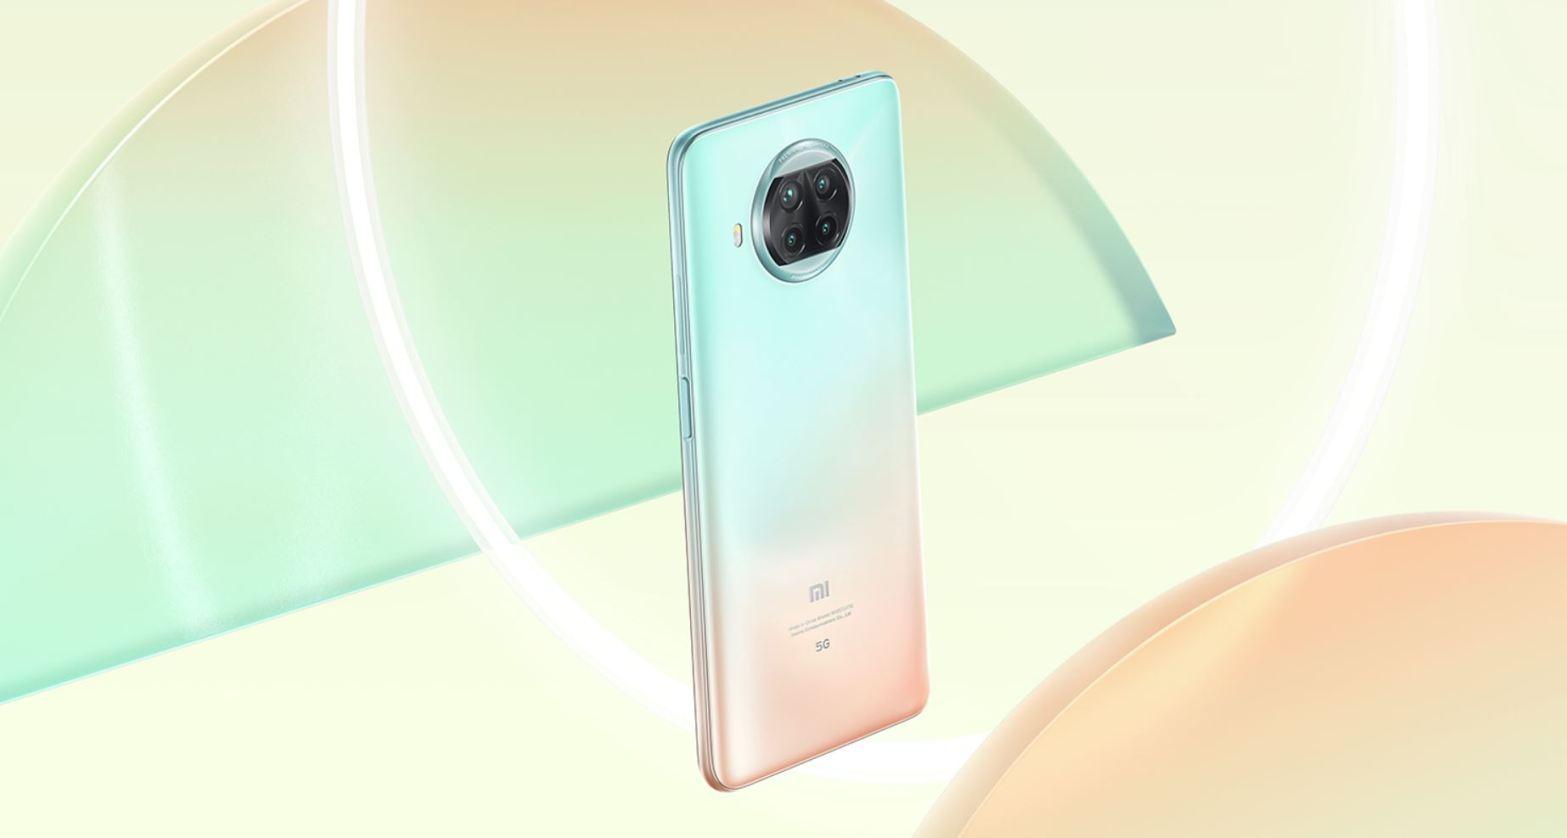 Xiaom Mi 10t Lite